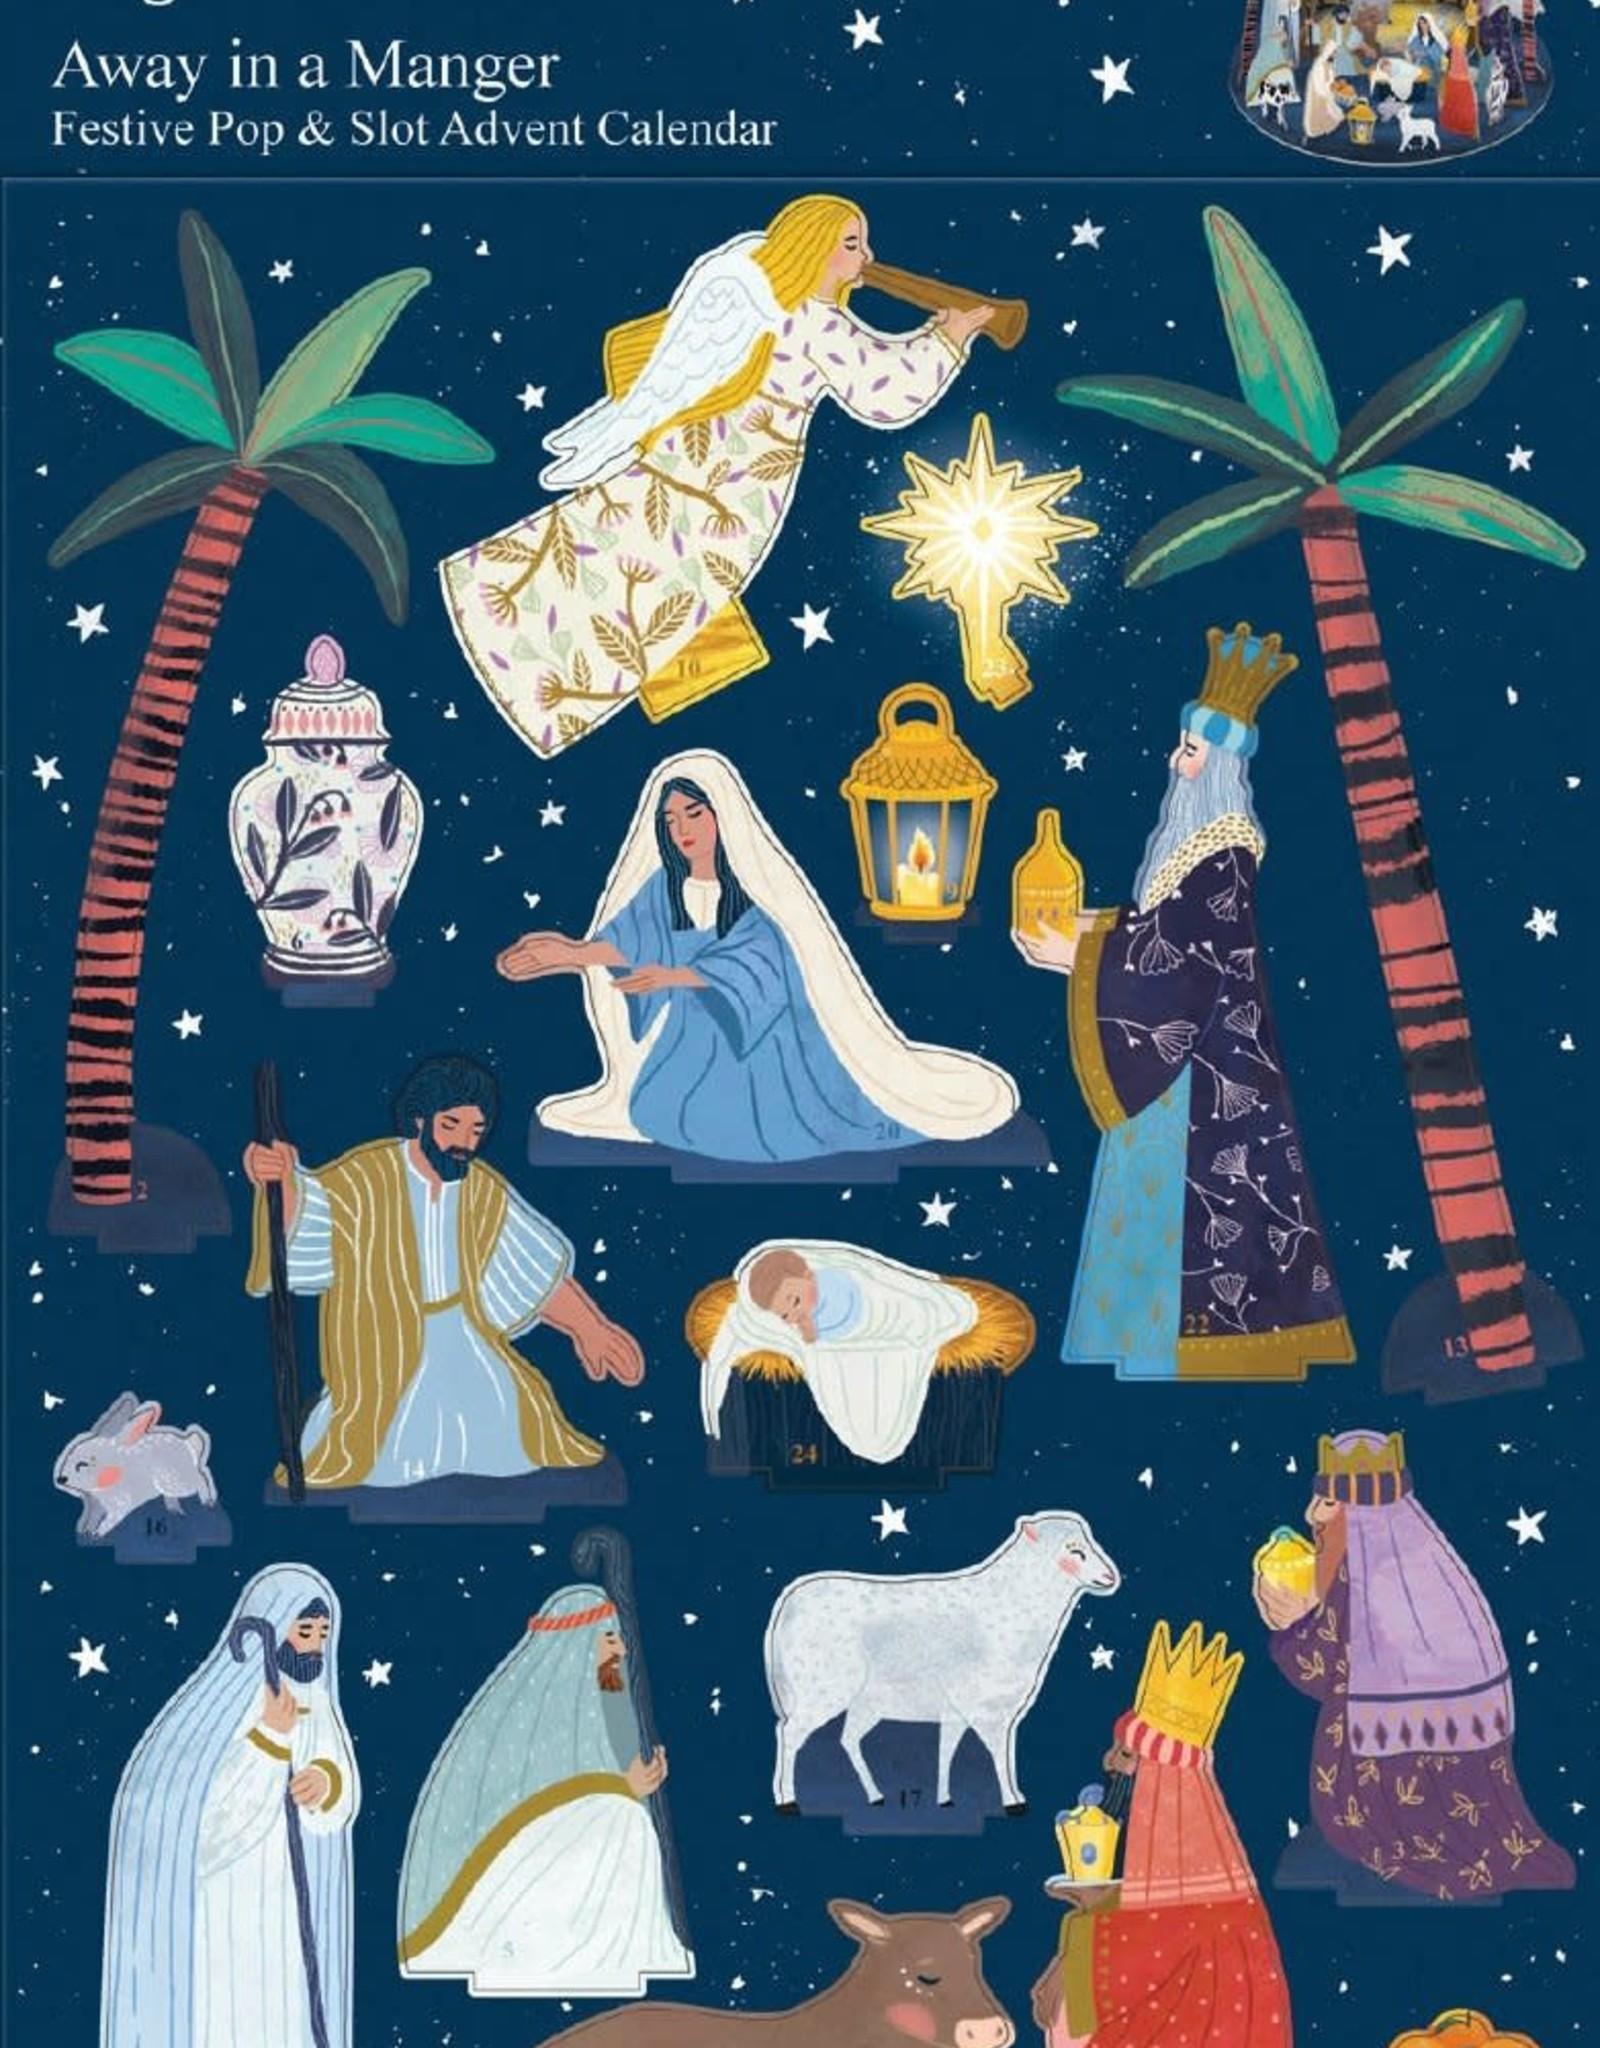 Pop & Slot Adventkalender Away in a Manger